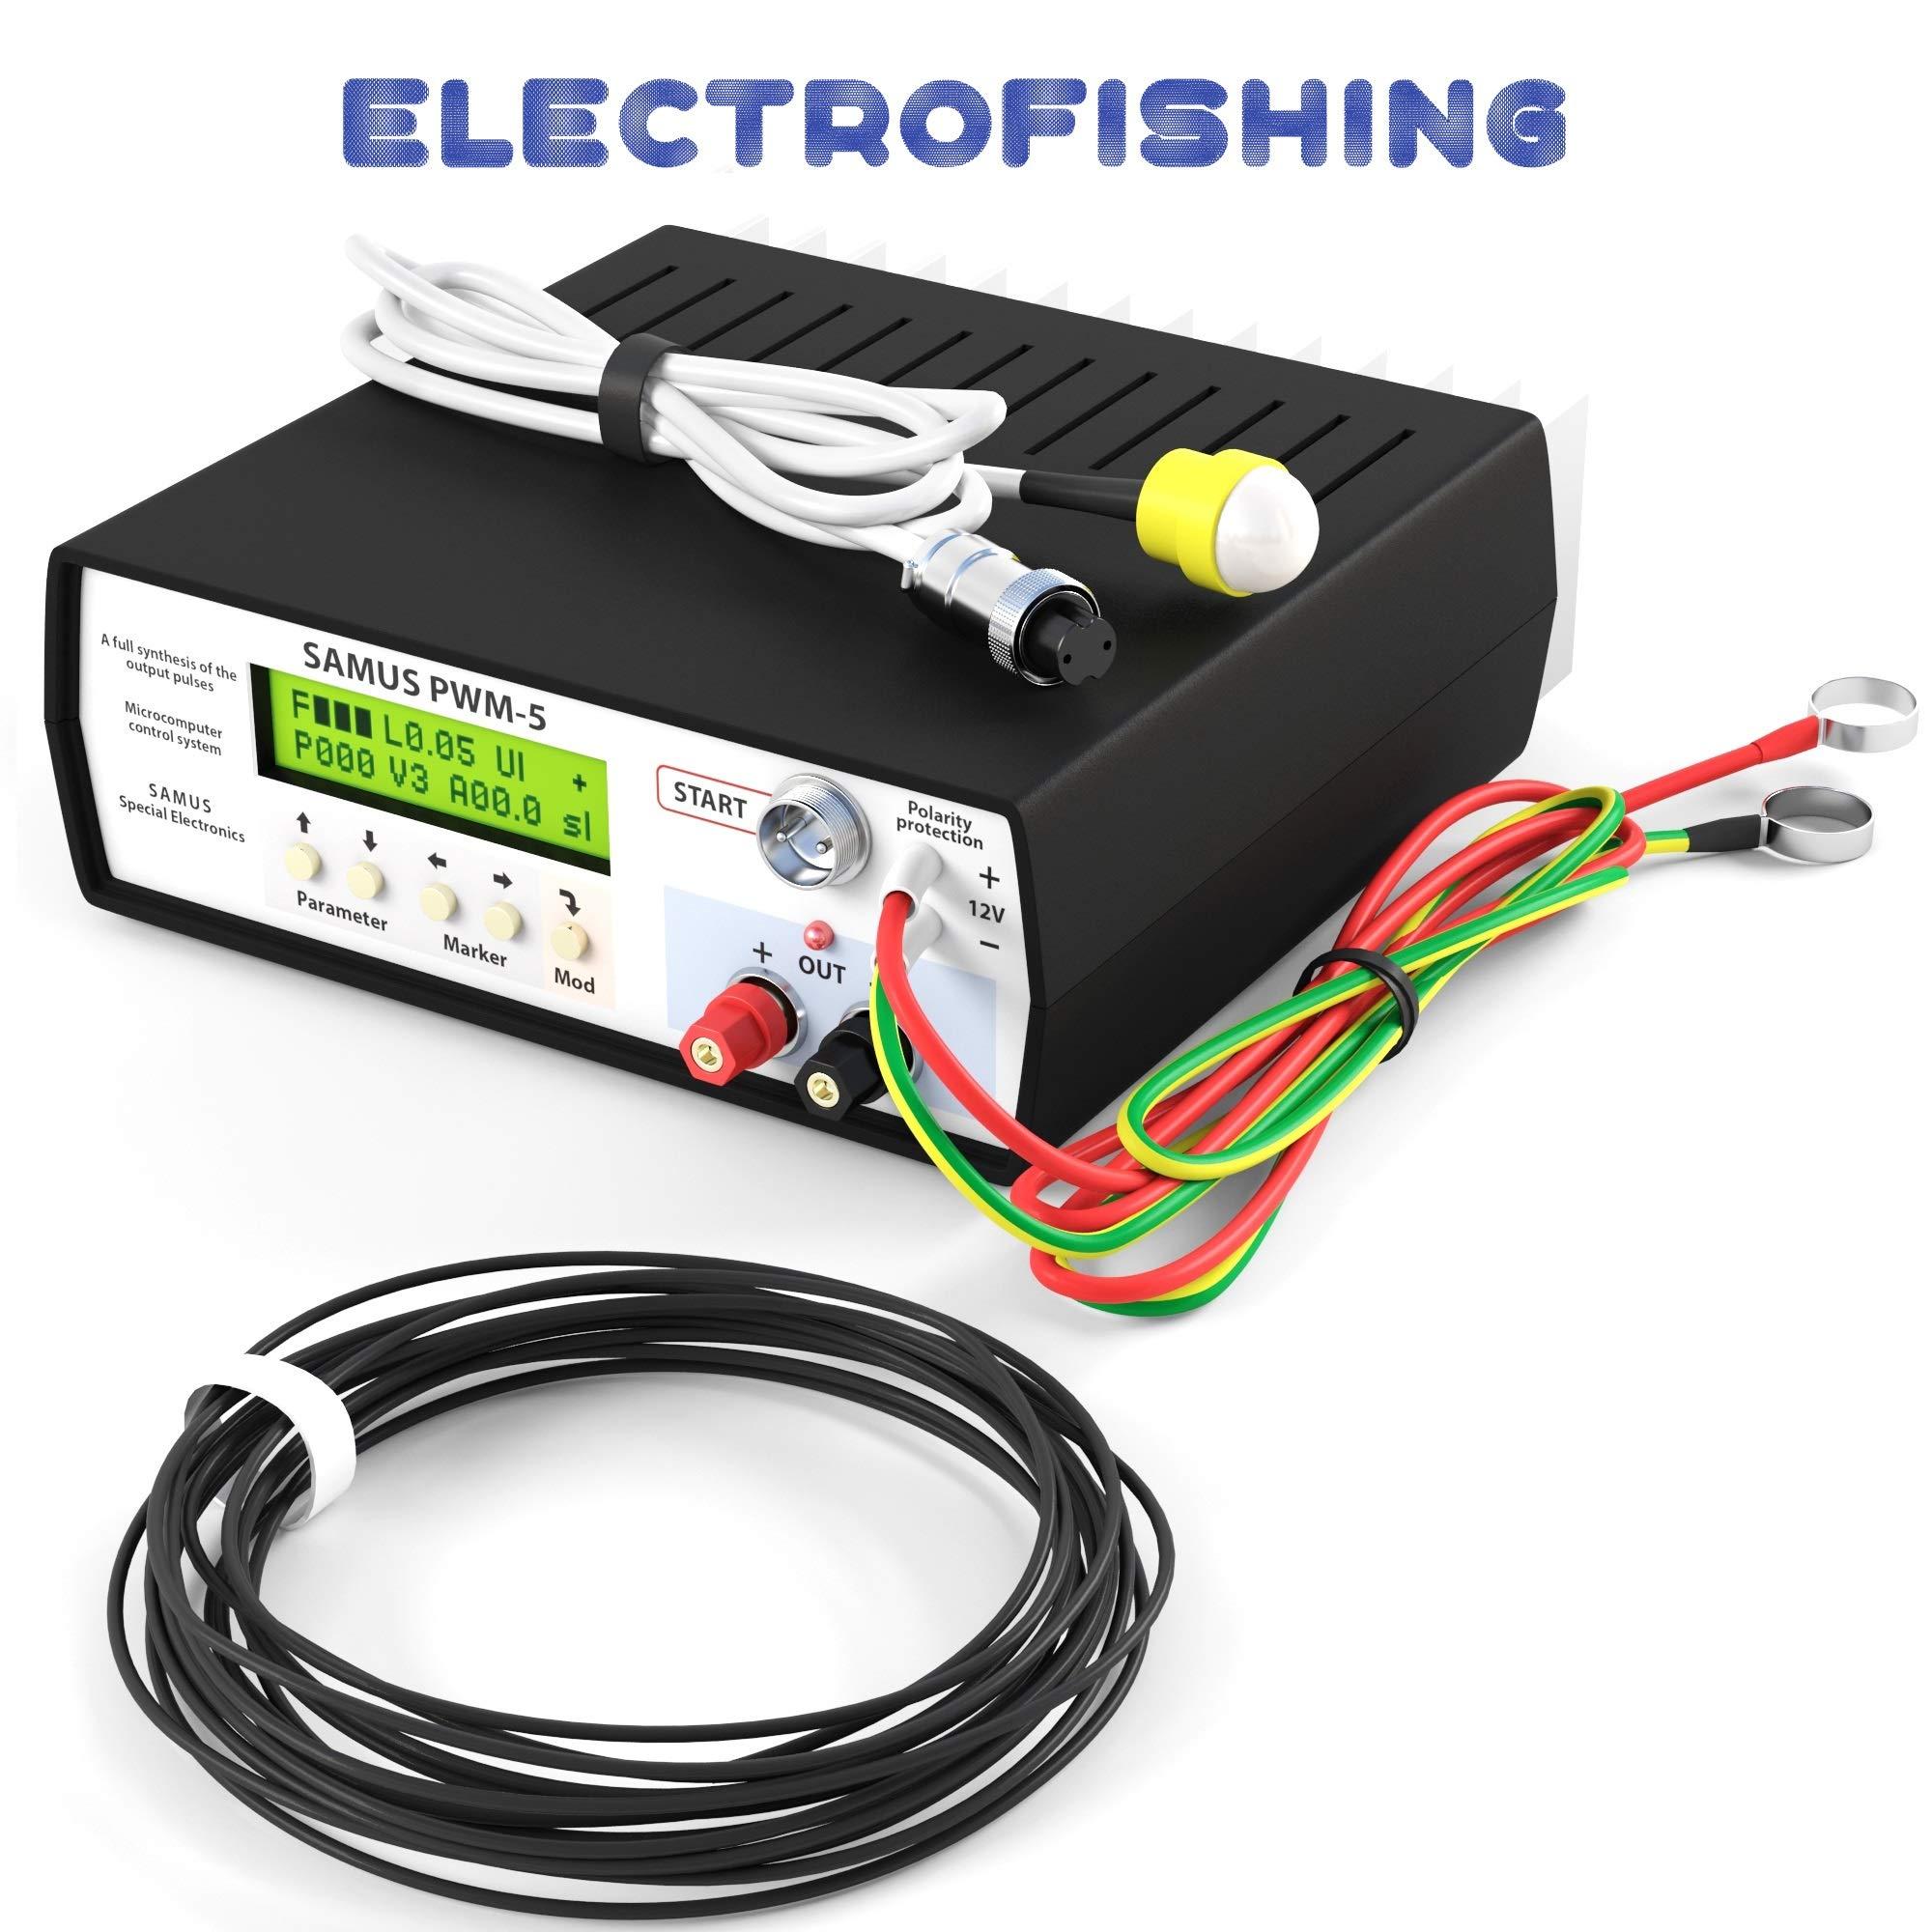 S1000 Fish Shocker Stunner - Freshwater Electro Fisher Professional Fishing Equipment with Catfish and carp Mode Inverter PWM-5 12V